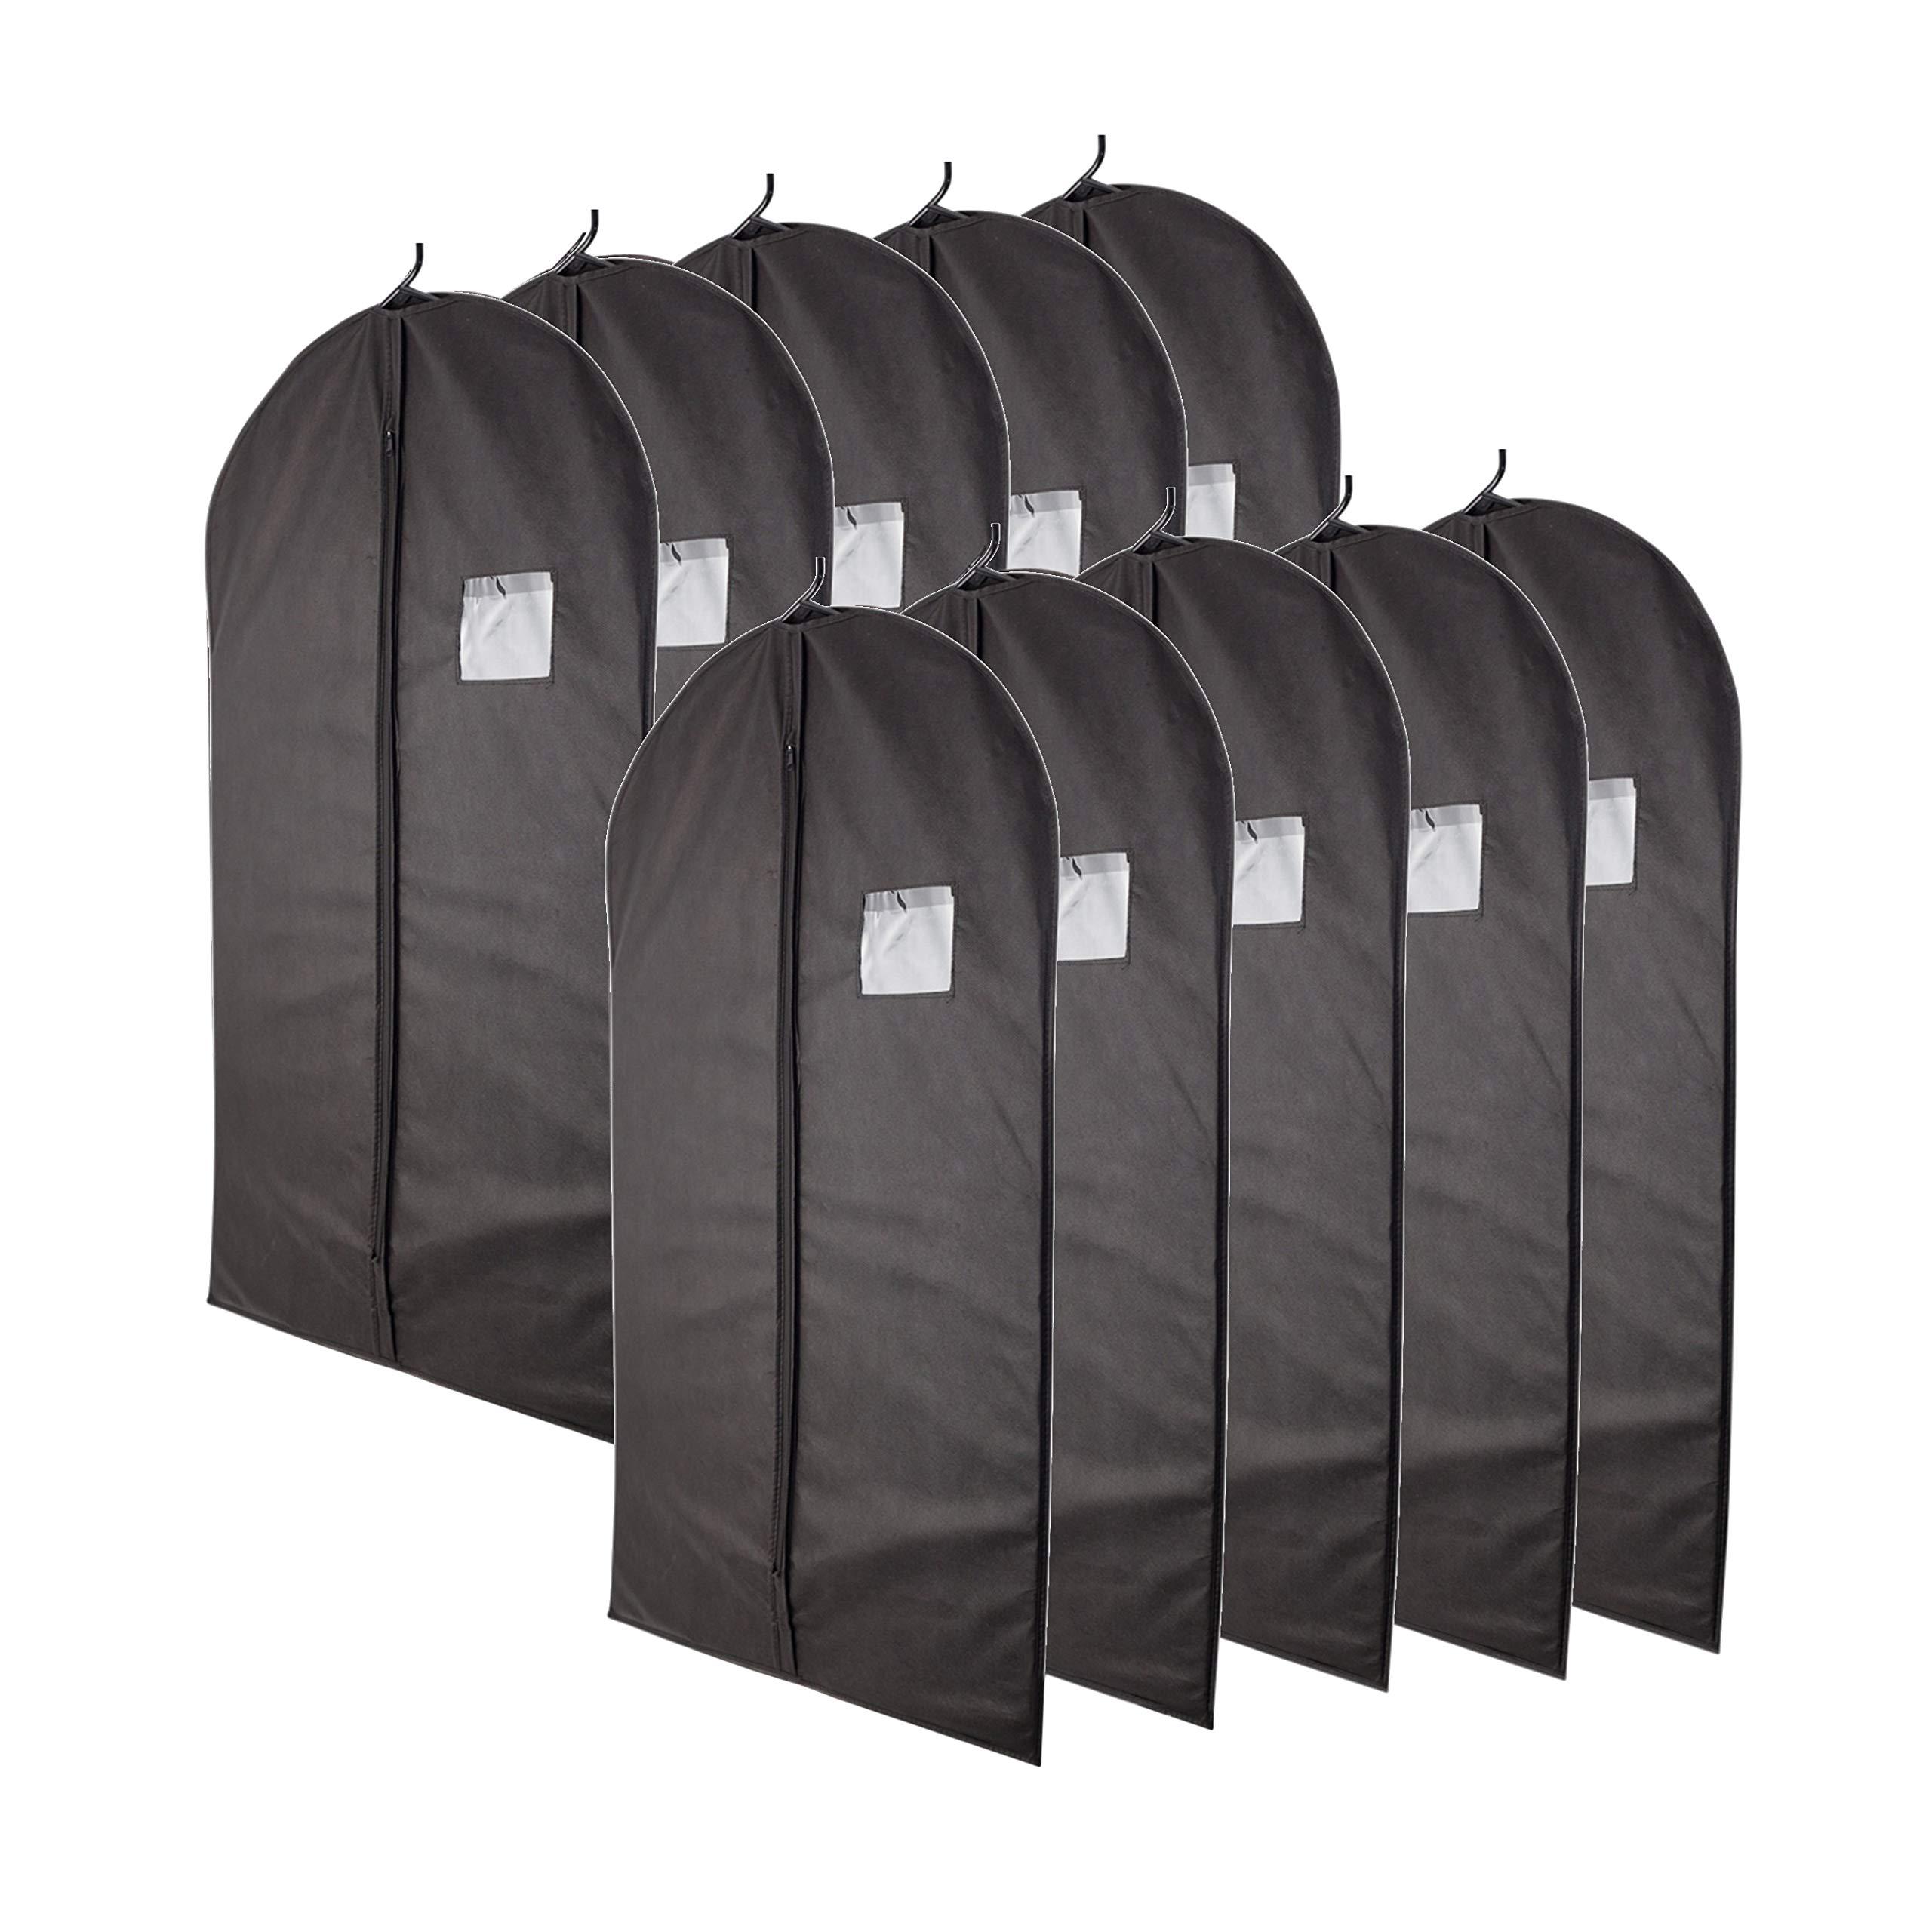 "Plixio 40"" Black Garment Bags for Breathable Storage of Suits, Dresses & Dance Costumes—Includes Zipper & Transparent Window (Pack of 10)"